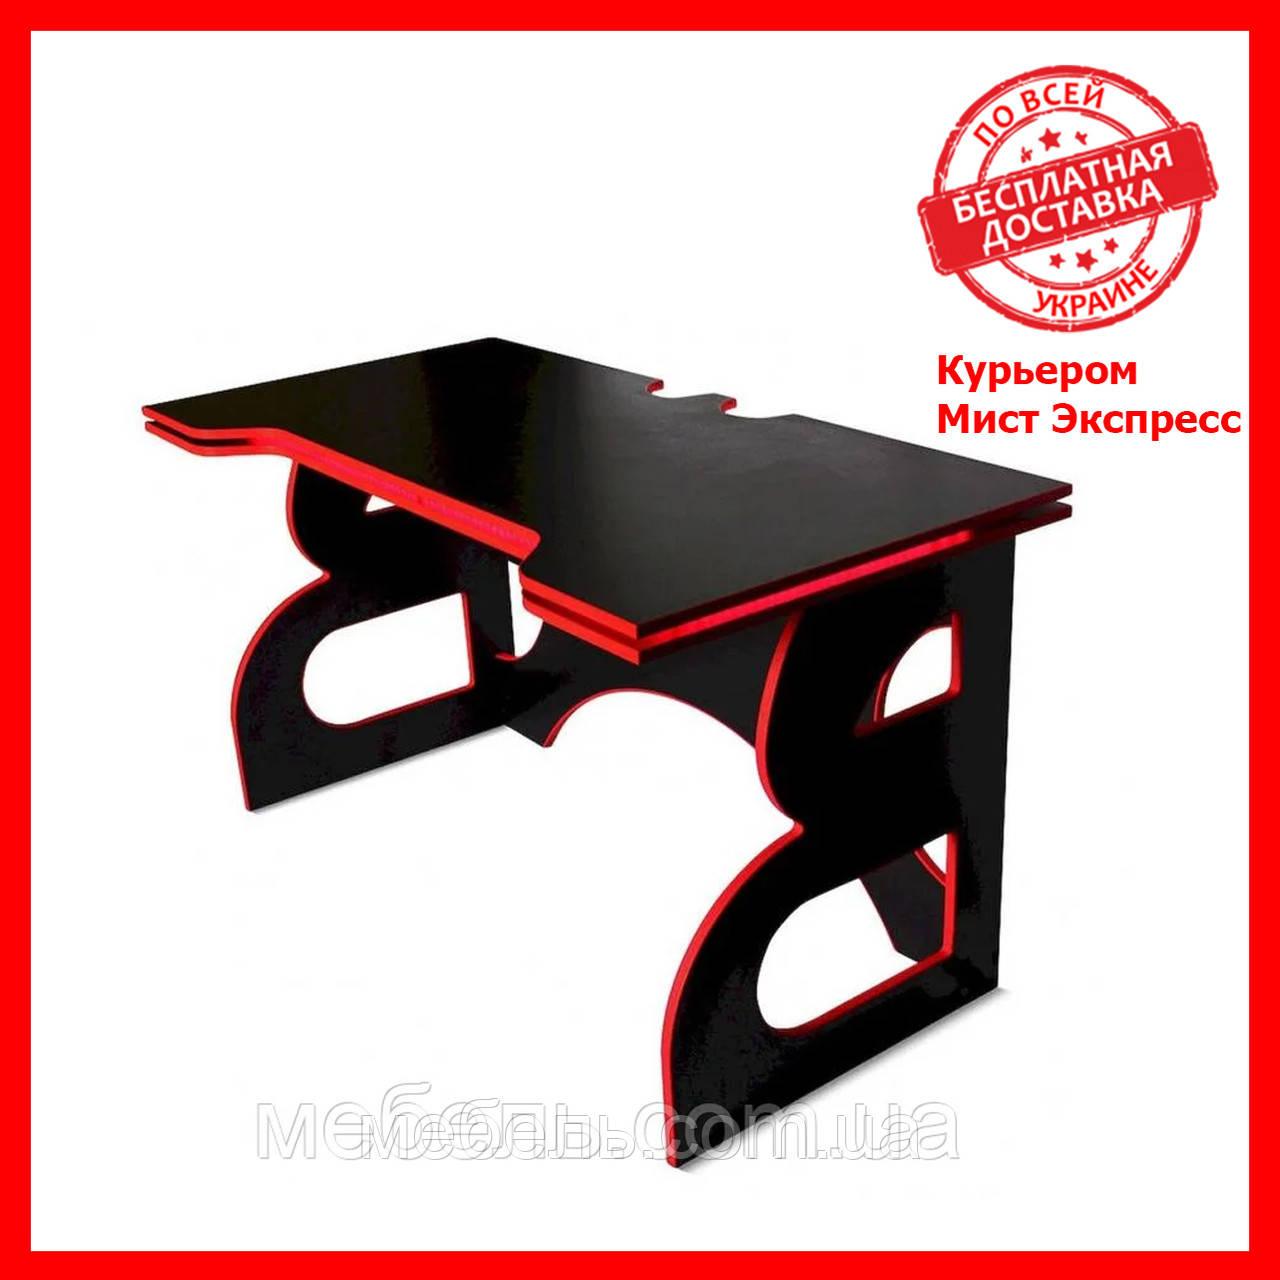 Компьютерный геймерский стол с тумбой Barsky Game Red HG-05/СUP-05/ПК-01